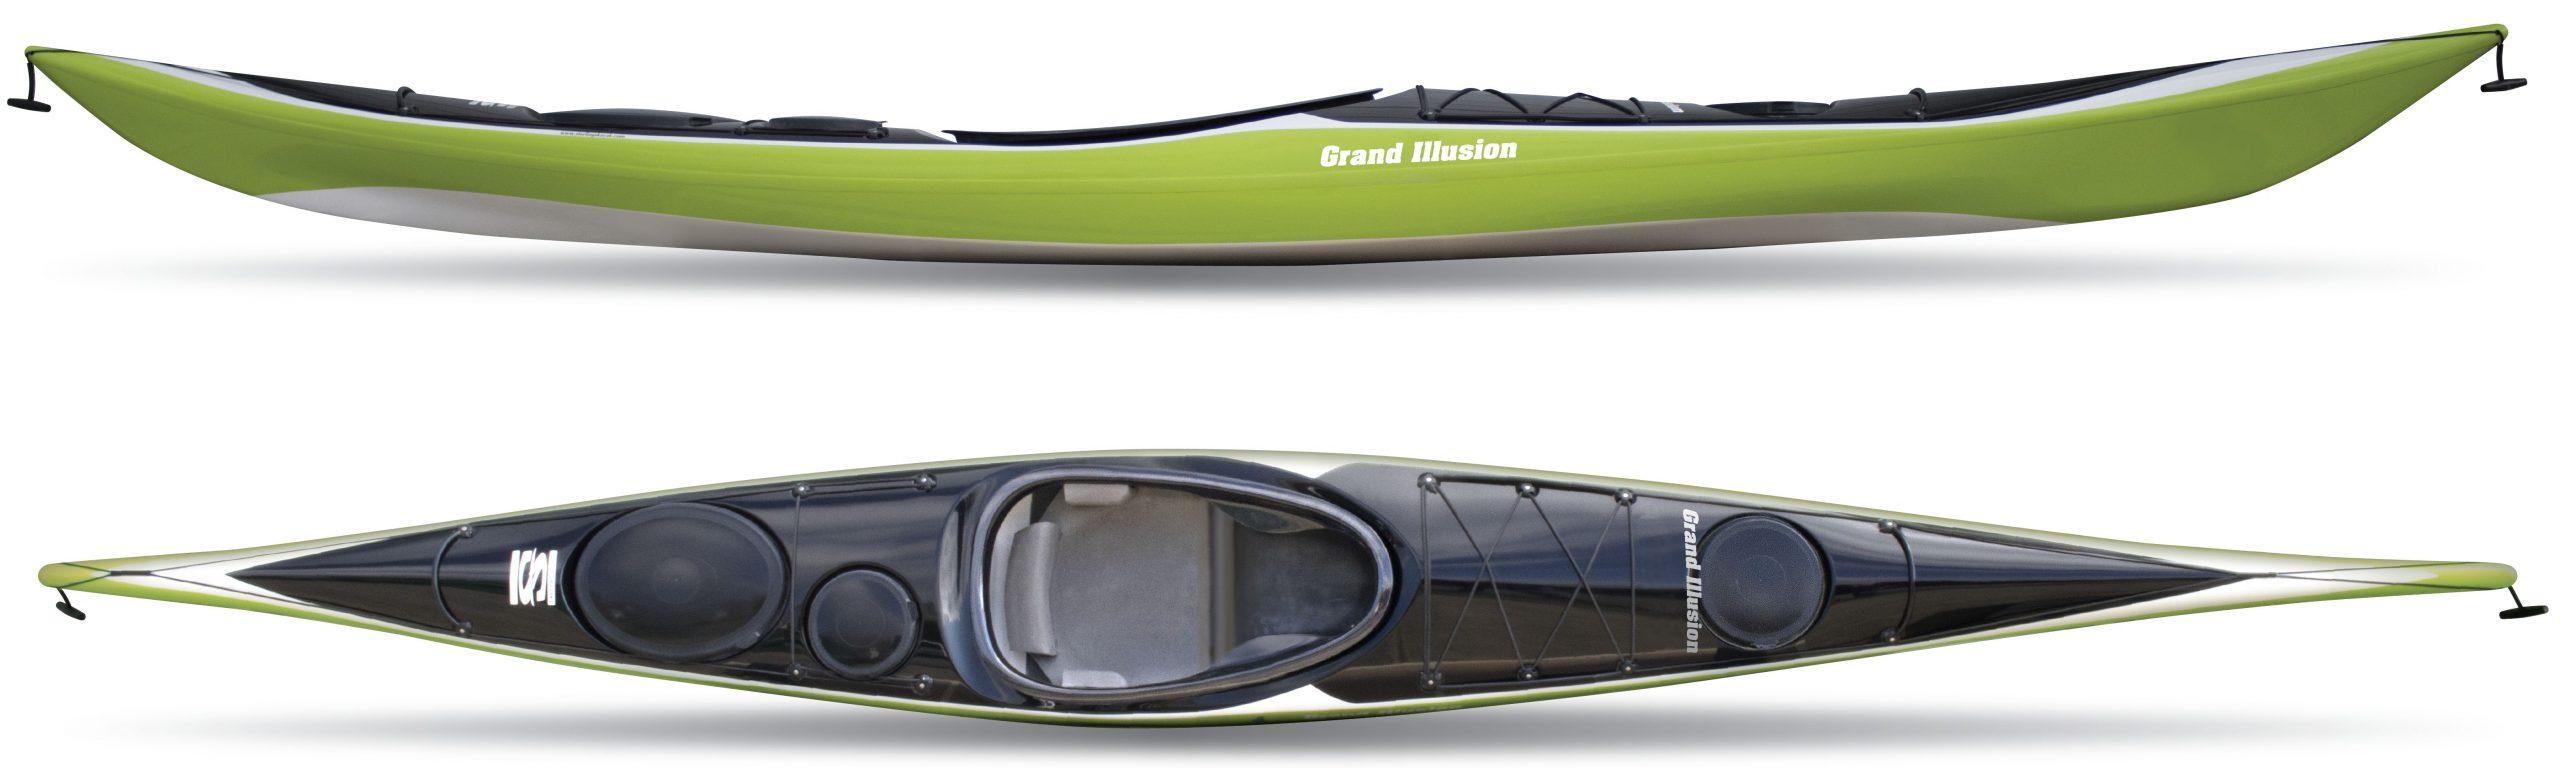 Grand Illusion Pure Performance Kayaks